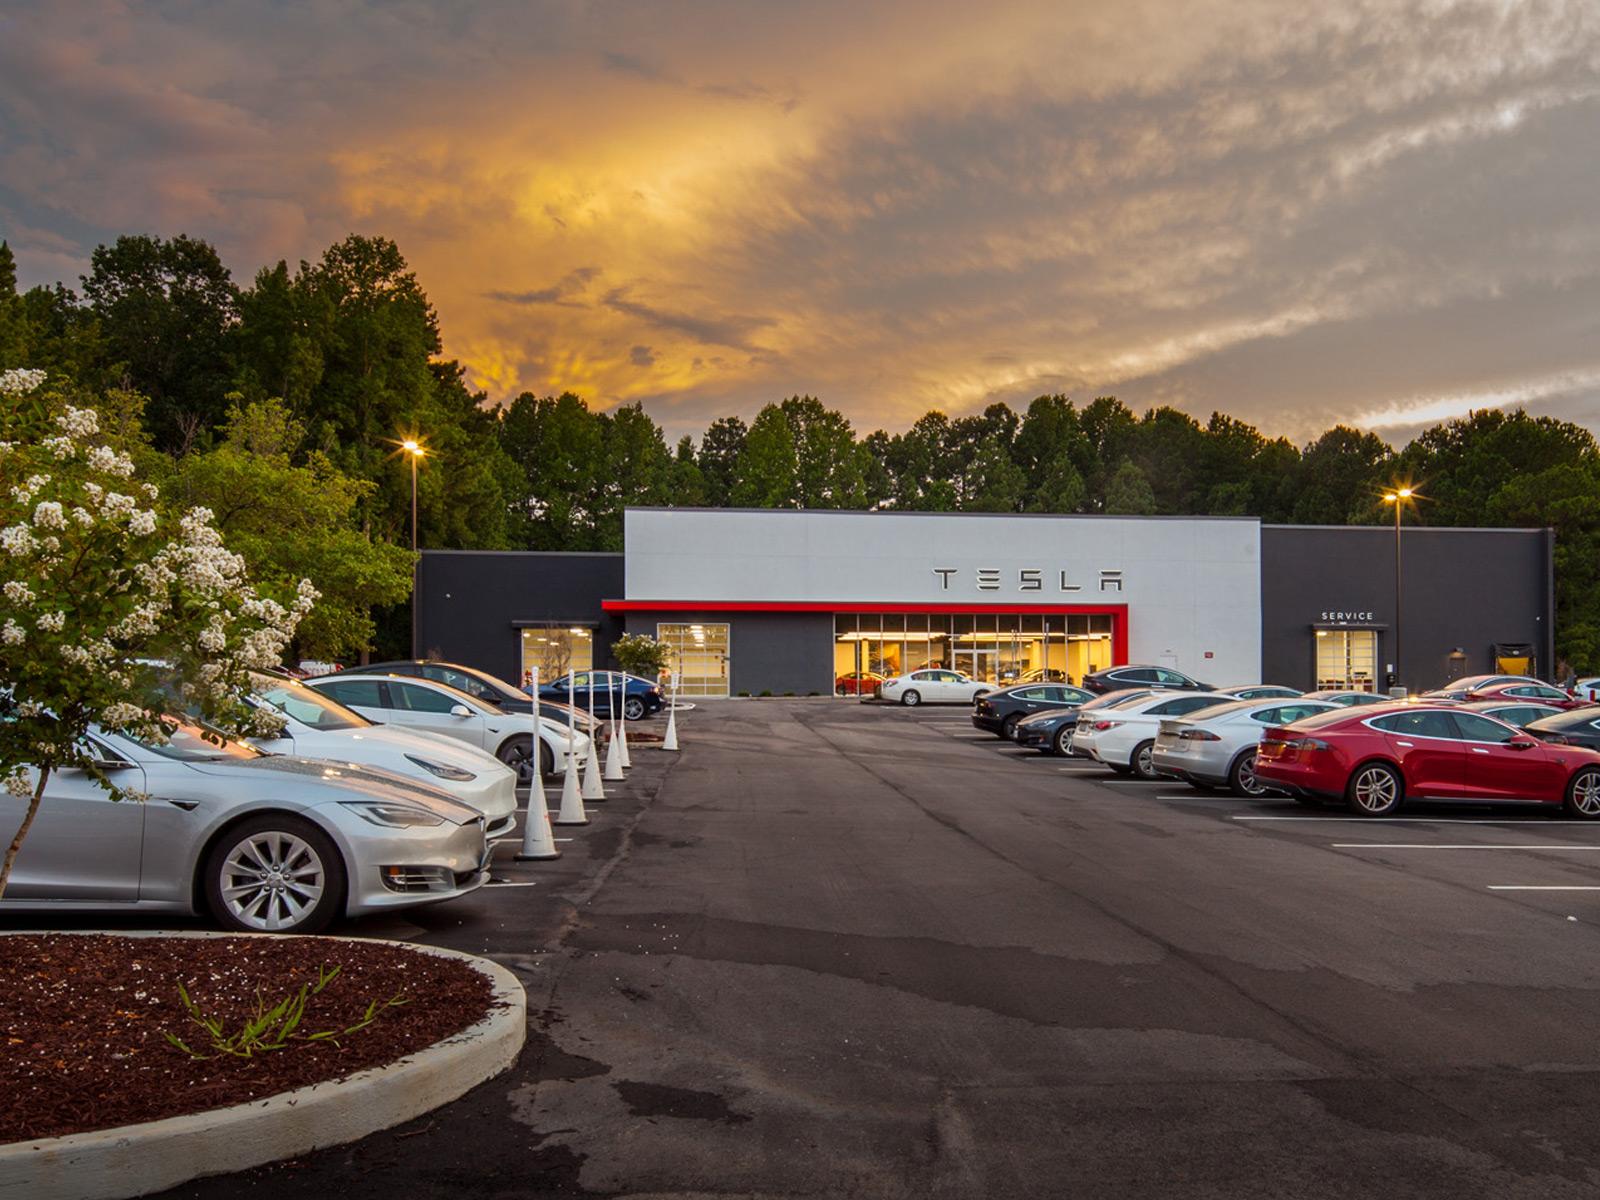 New Tesla Showroom in Raleigh